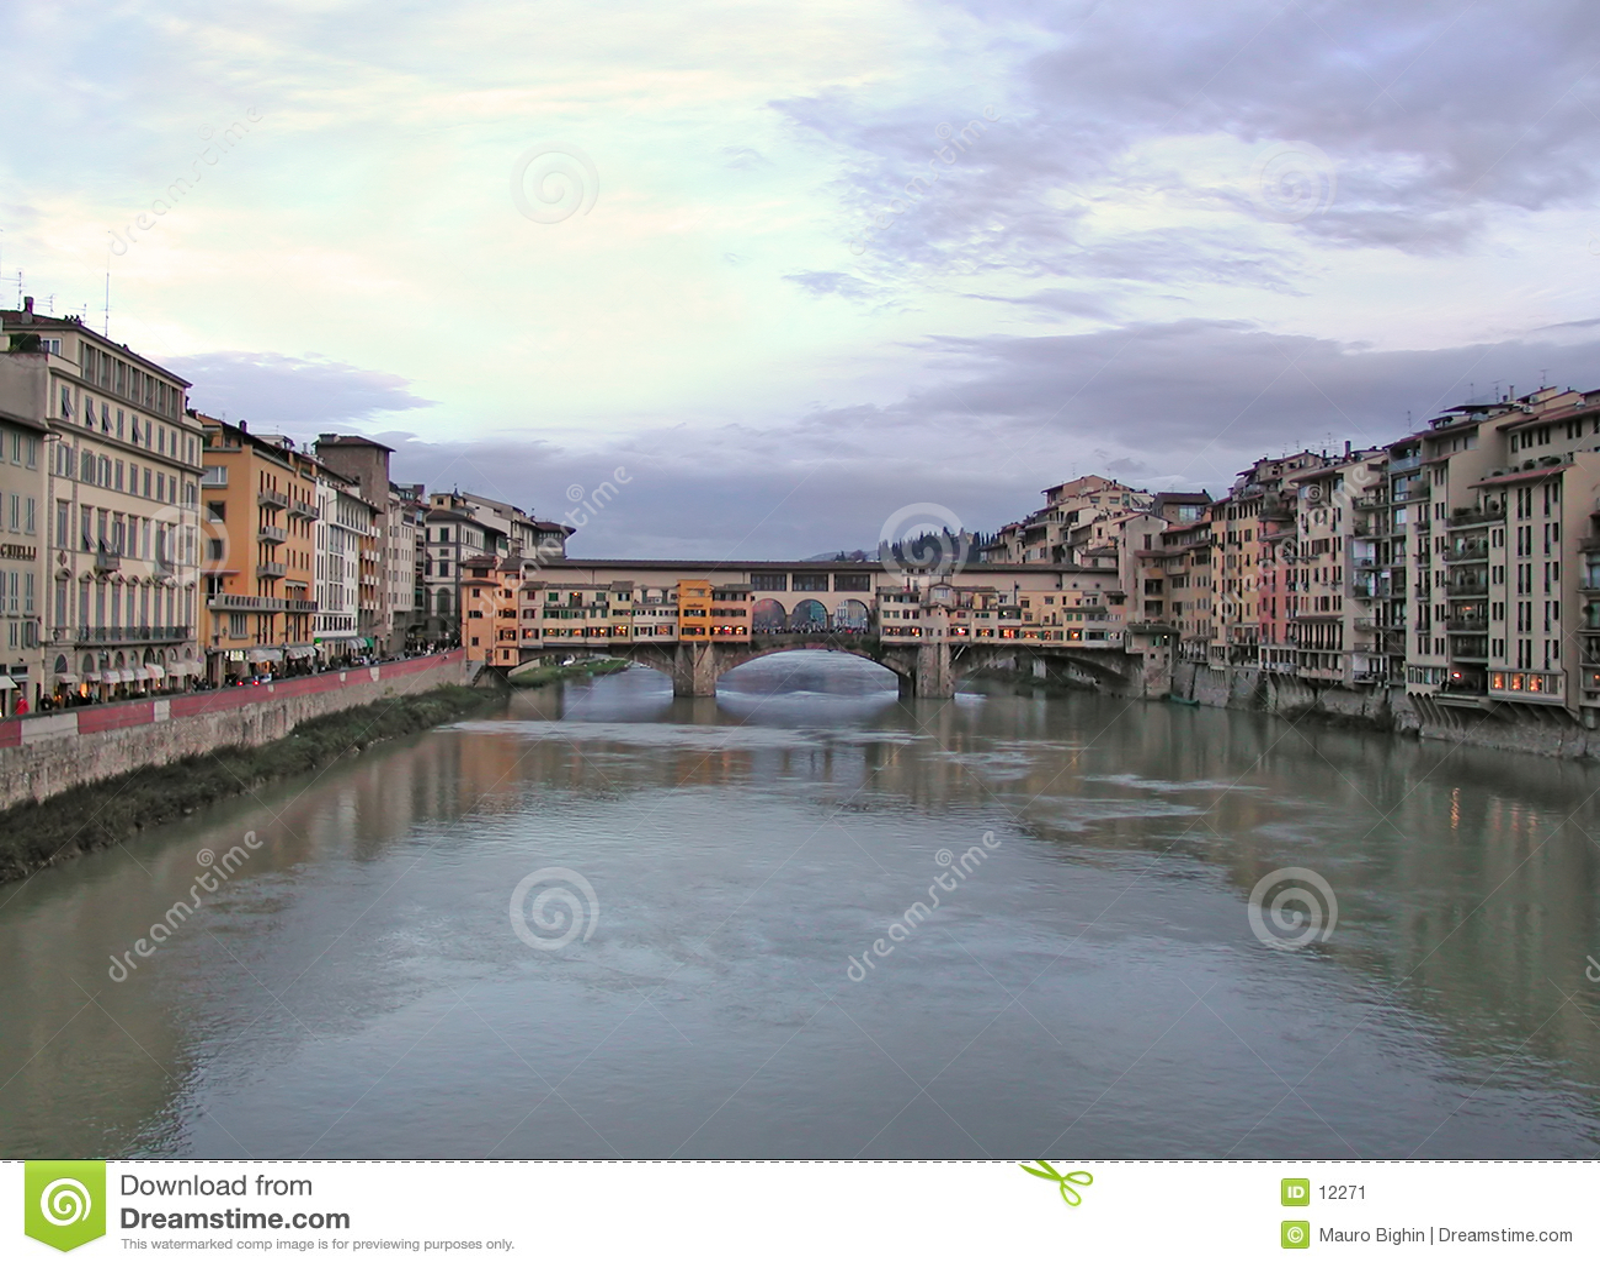 Old Bridge - Ponte vecchio - Florence - Italy